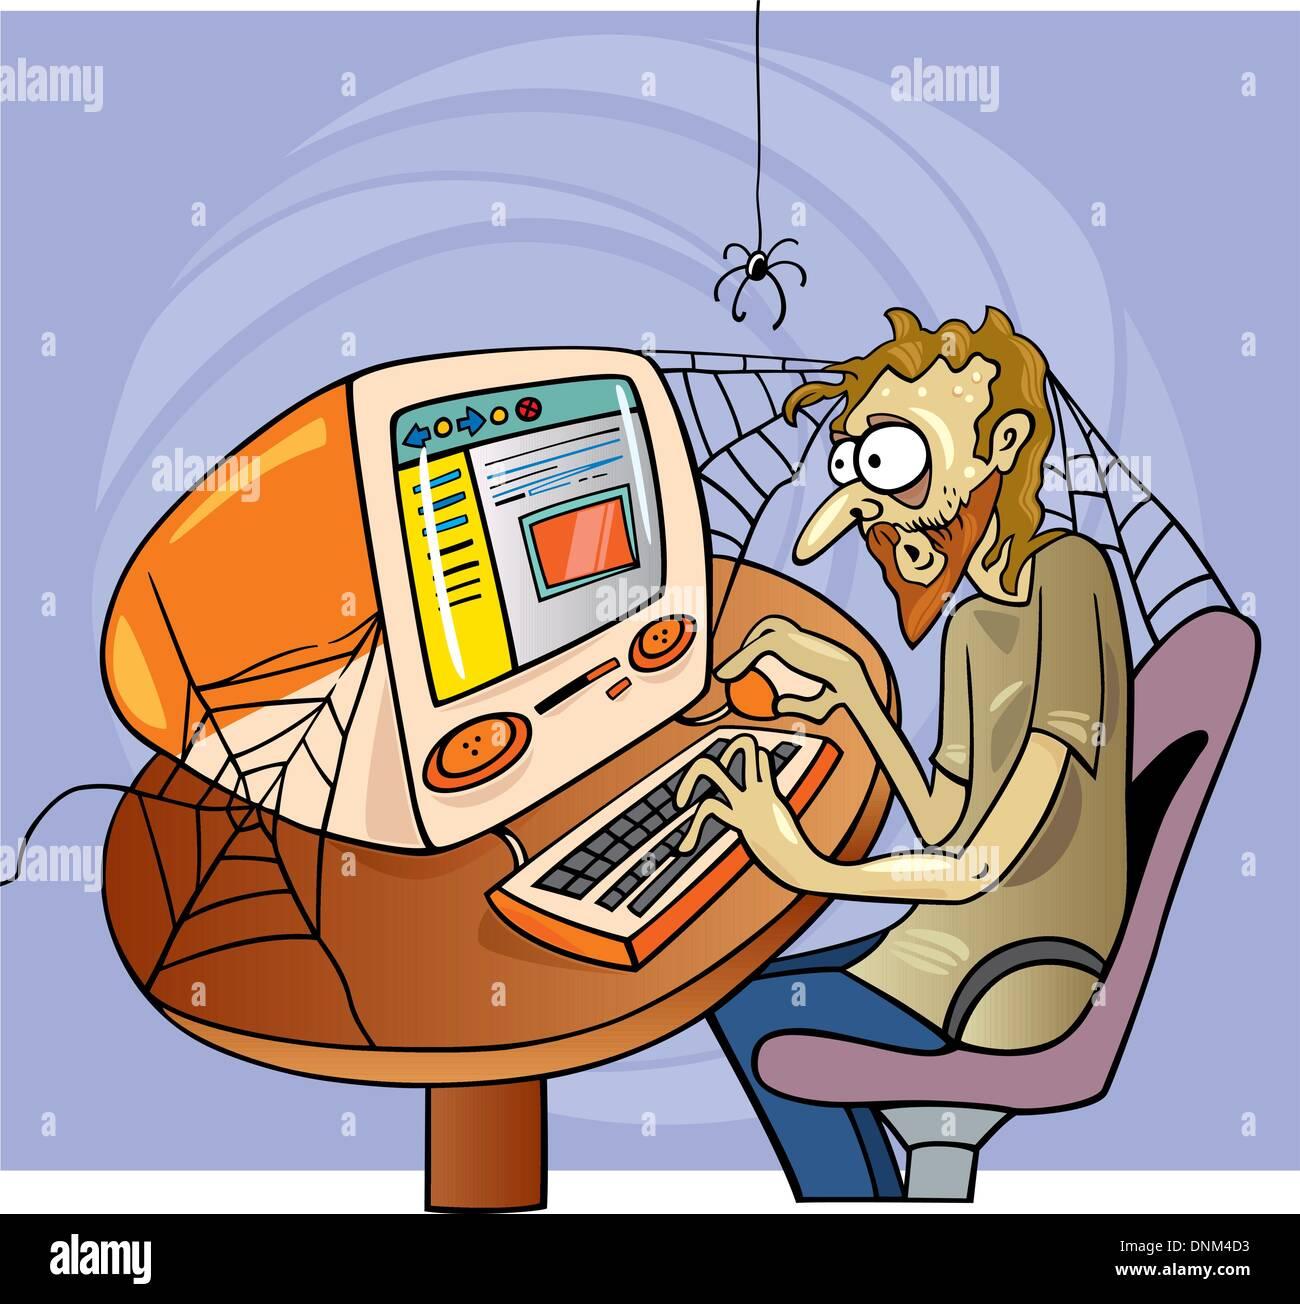 cartoon illustration of manic internet user - Stock Image